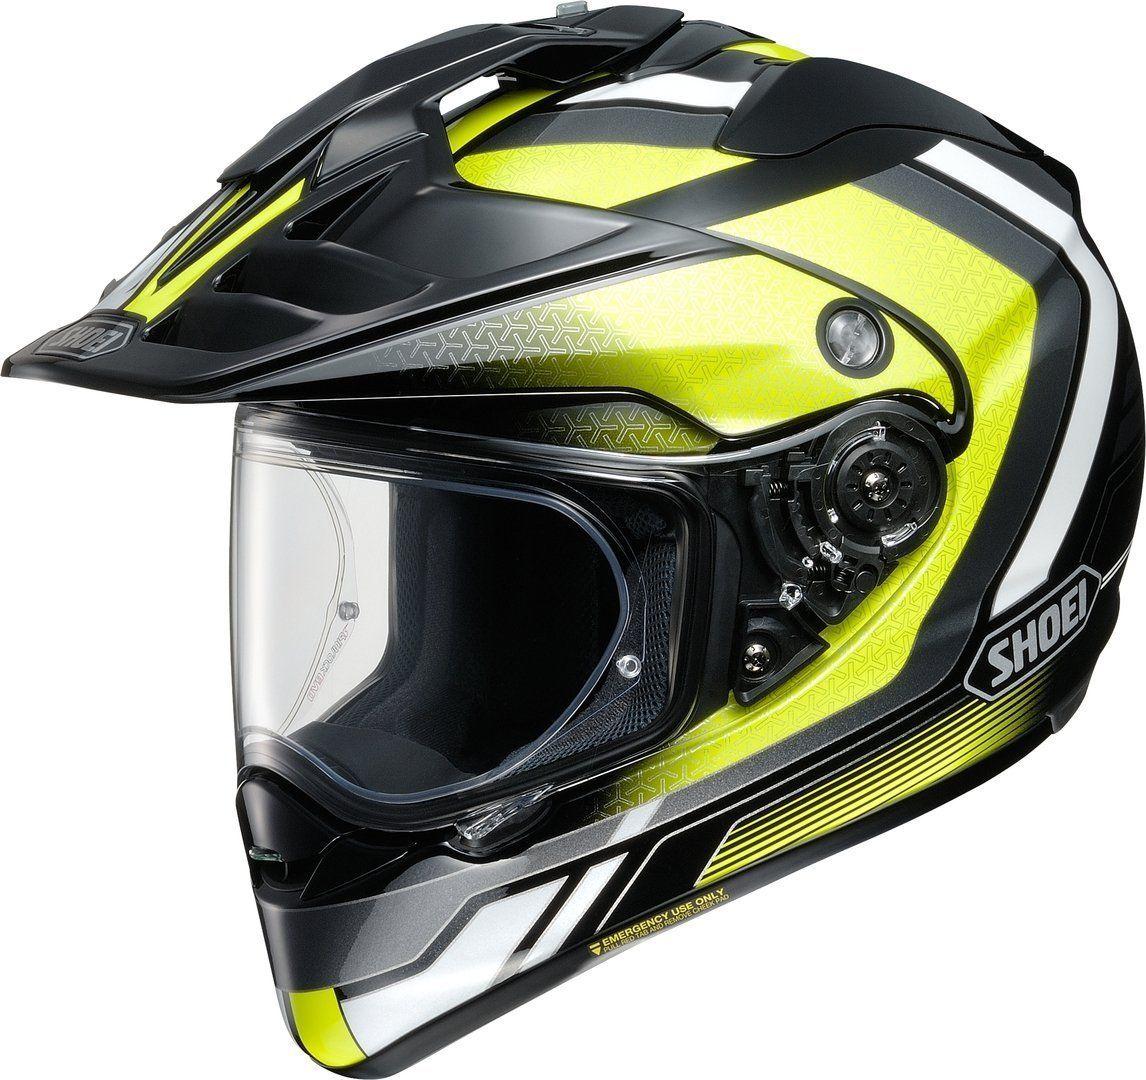 SHOEI Hornet ADV Sovereign TC-3 Adventure Helmet XL